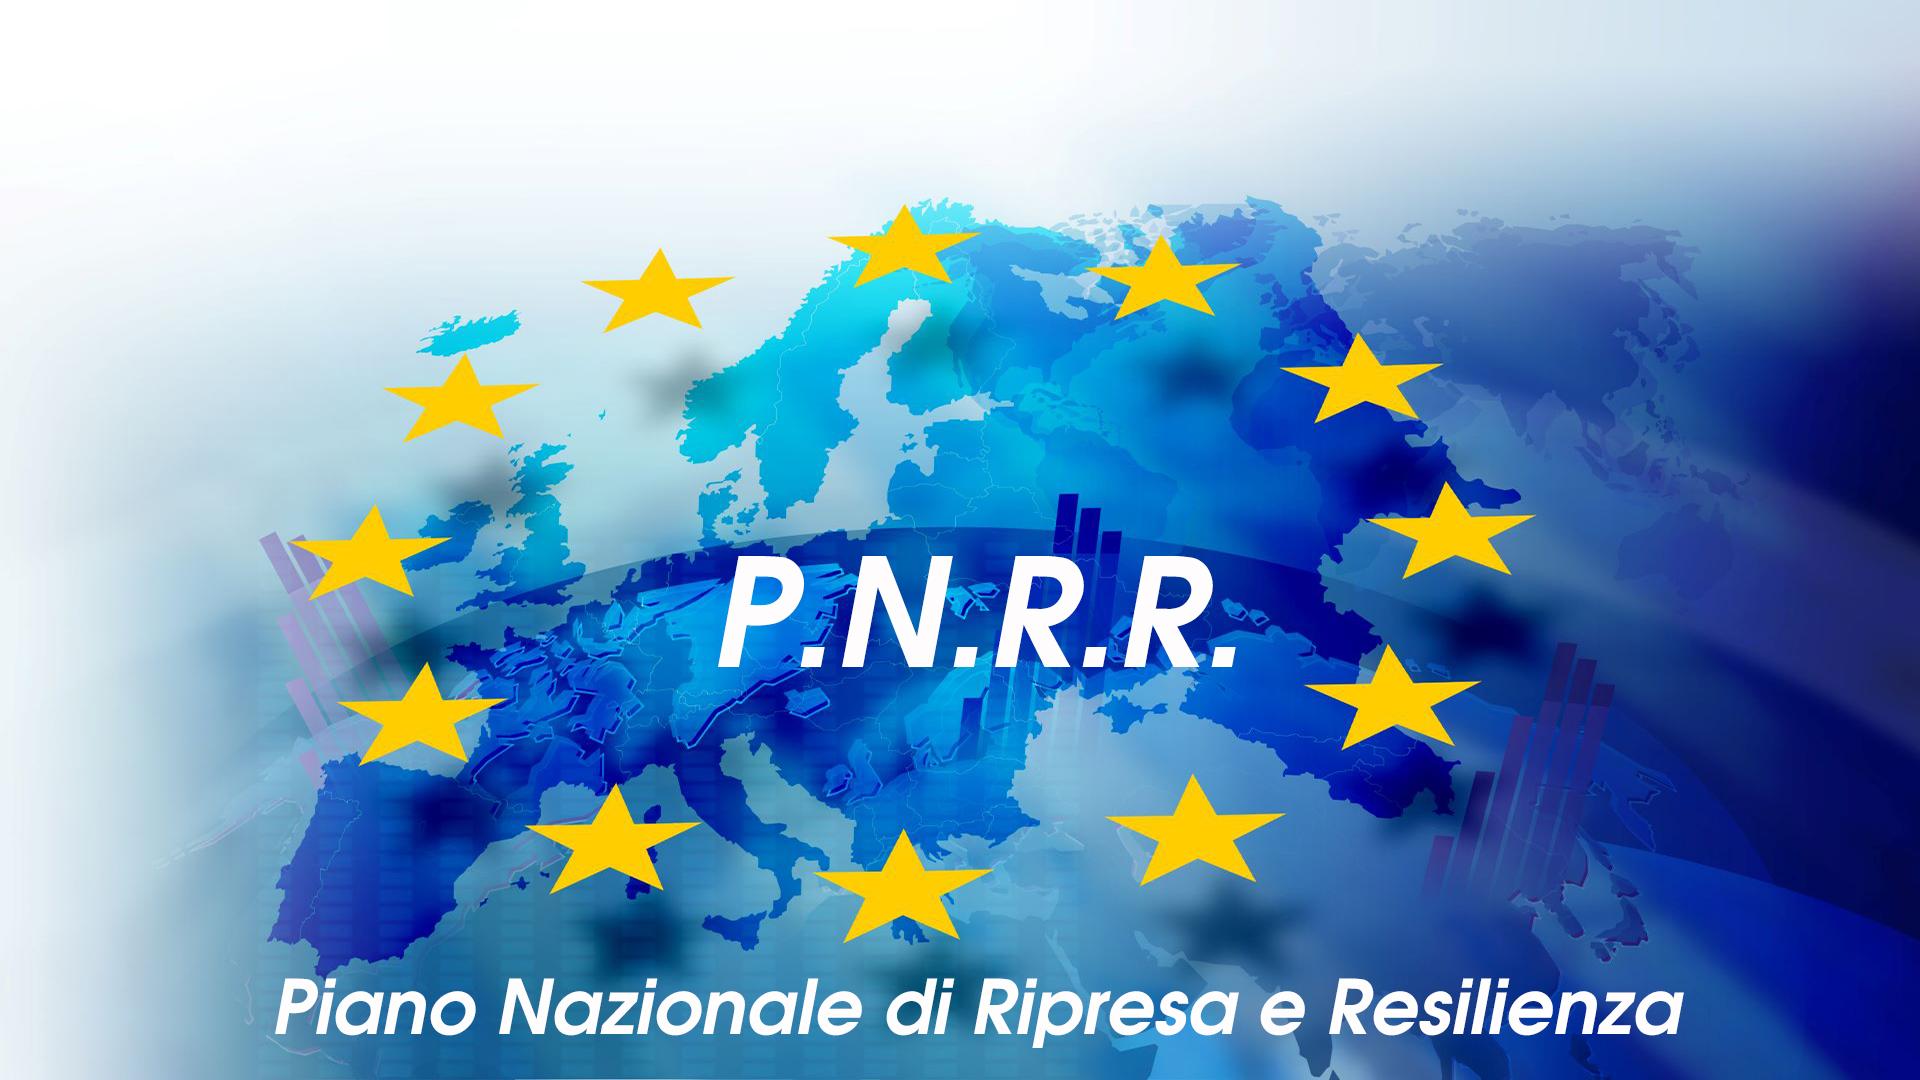 PNRR Next Generation EU 200